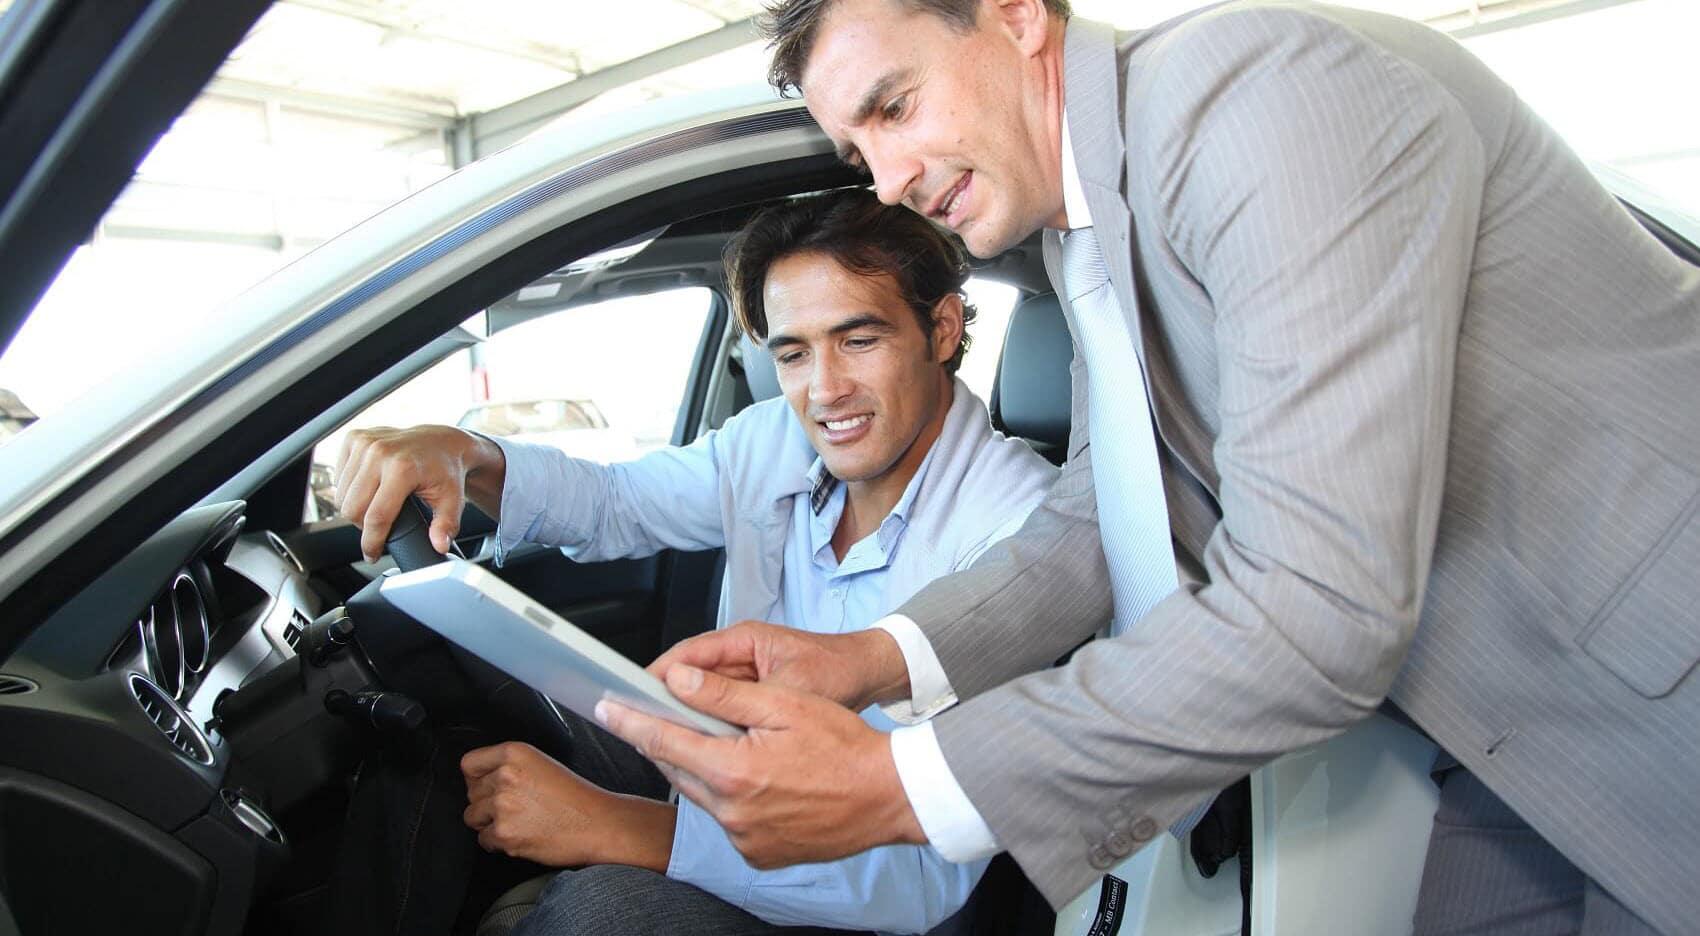 Test Drive at Dealership